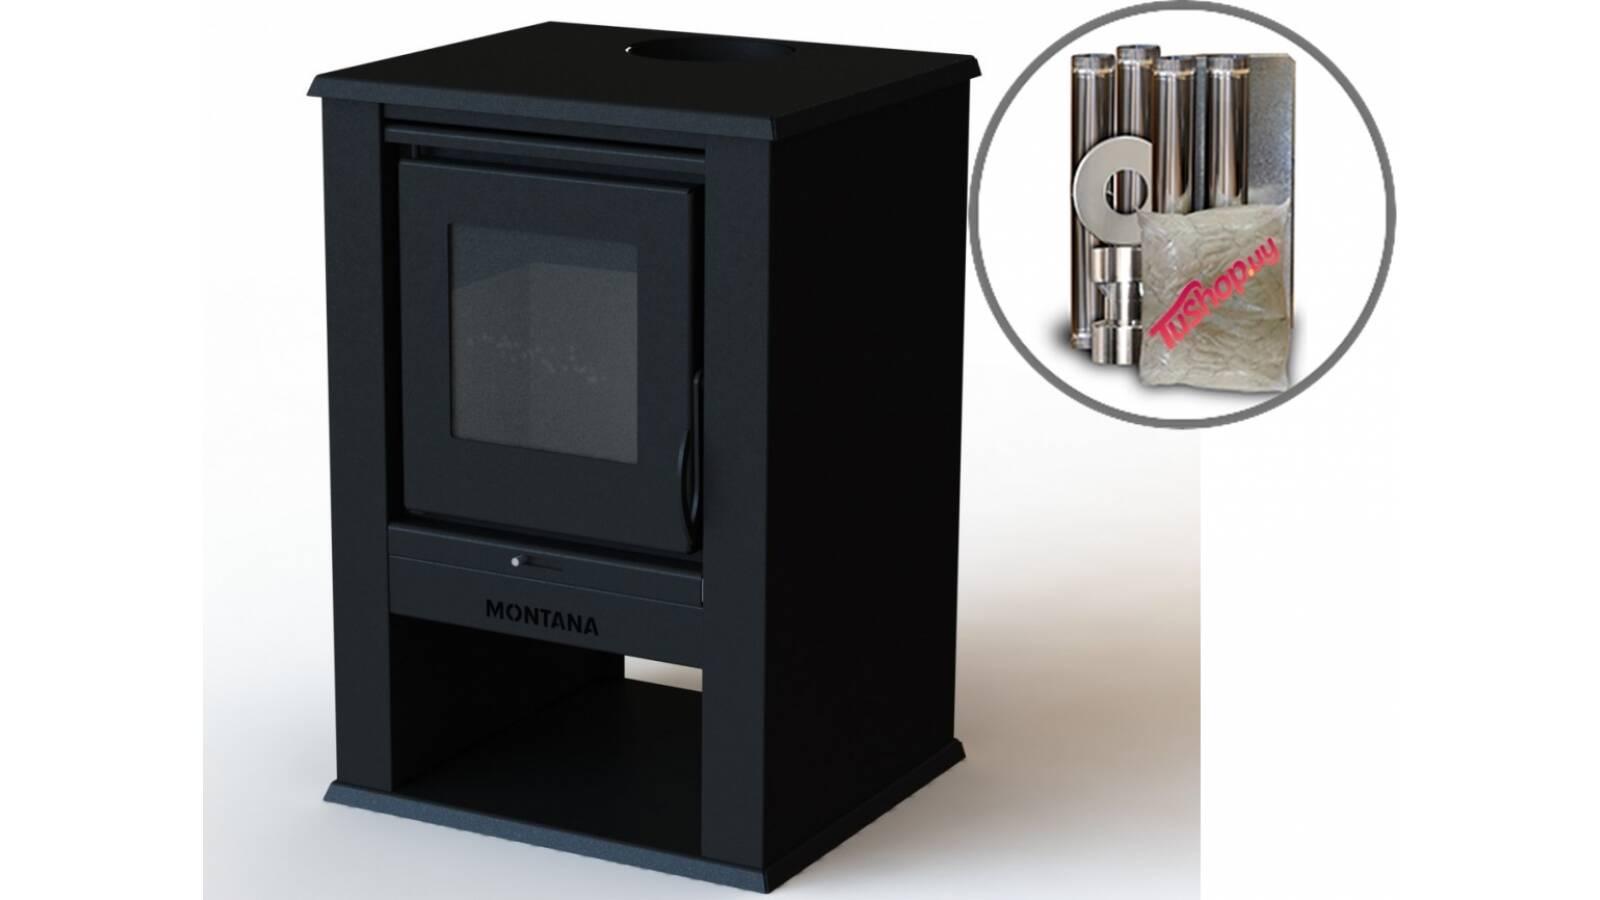 Estufa calefactor a leña Montana 9 KW - Cubre 93 m2 con kit de cañeria basico